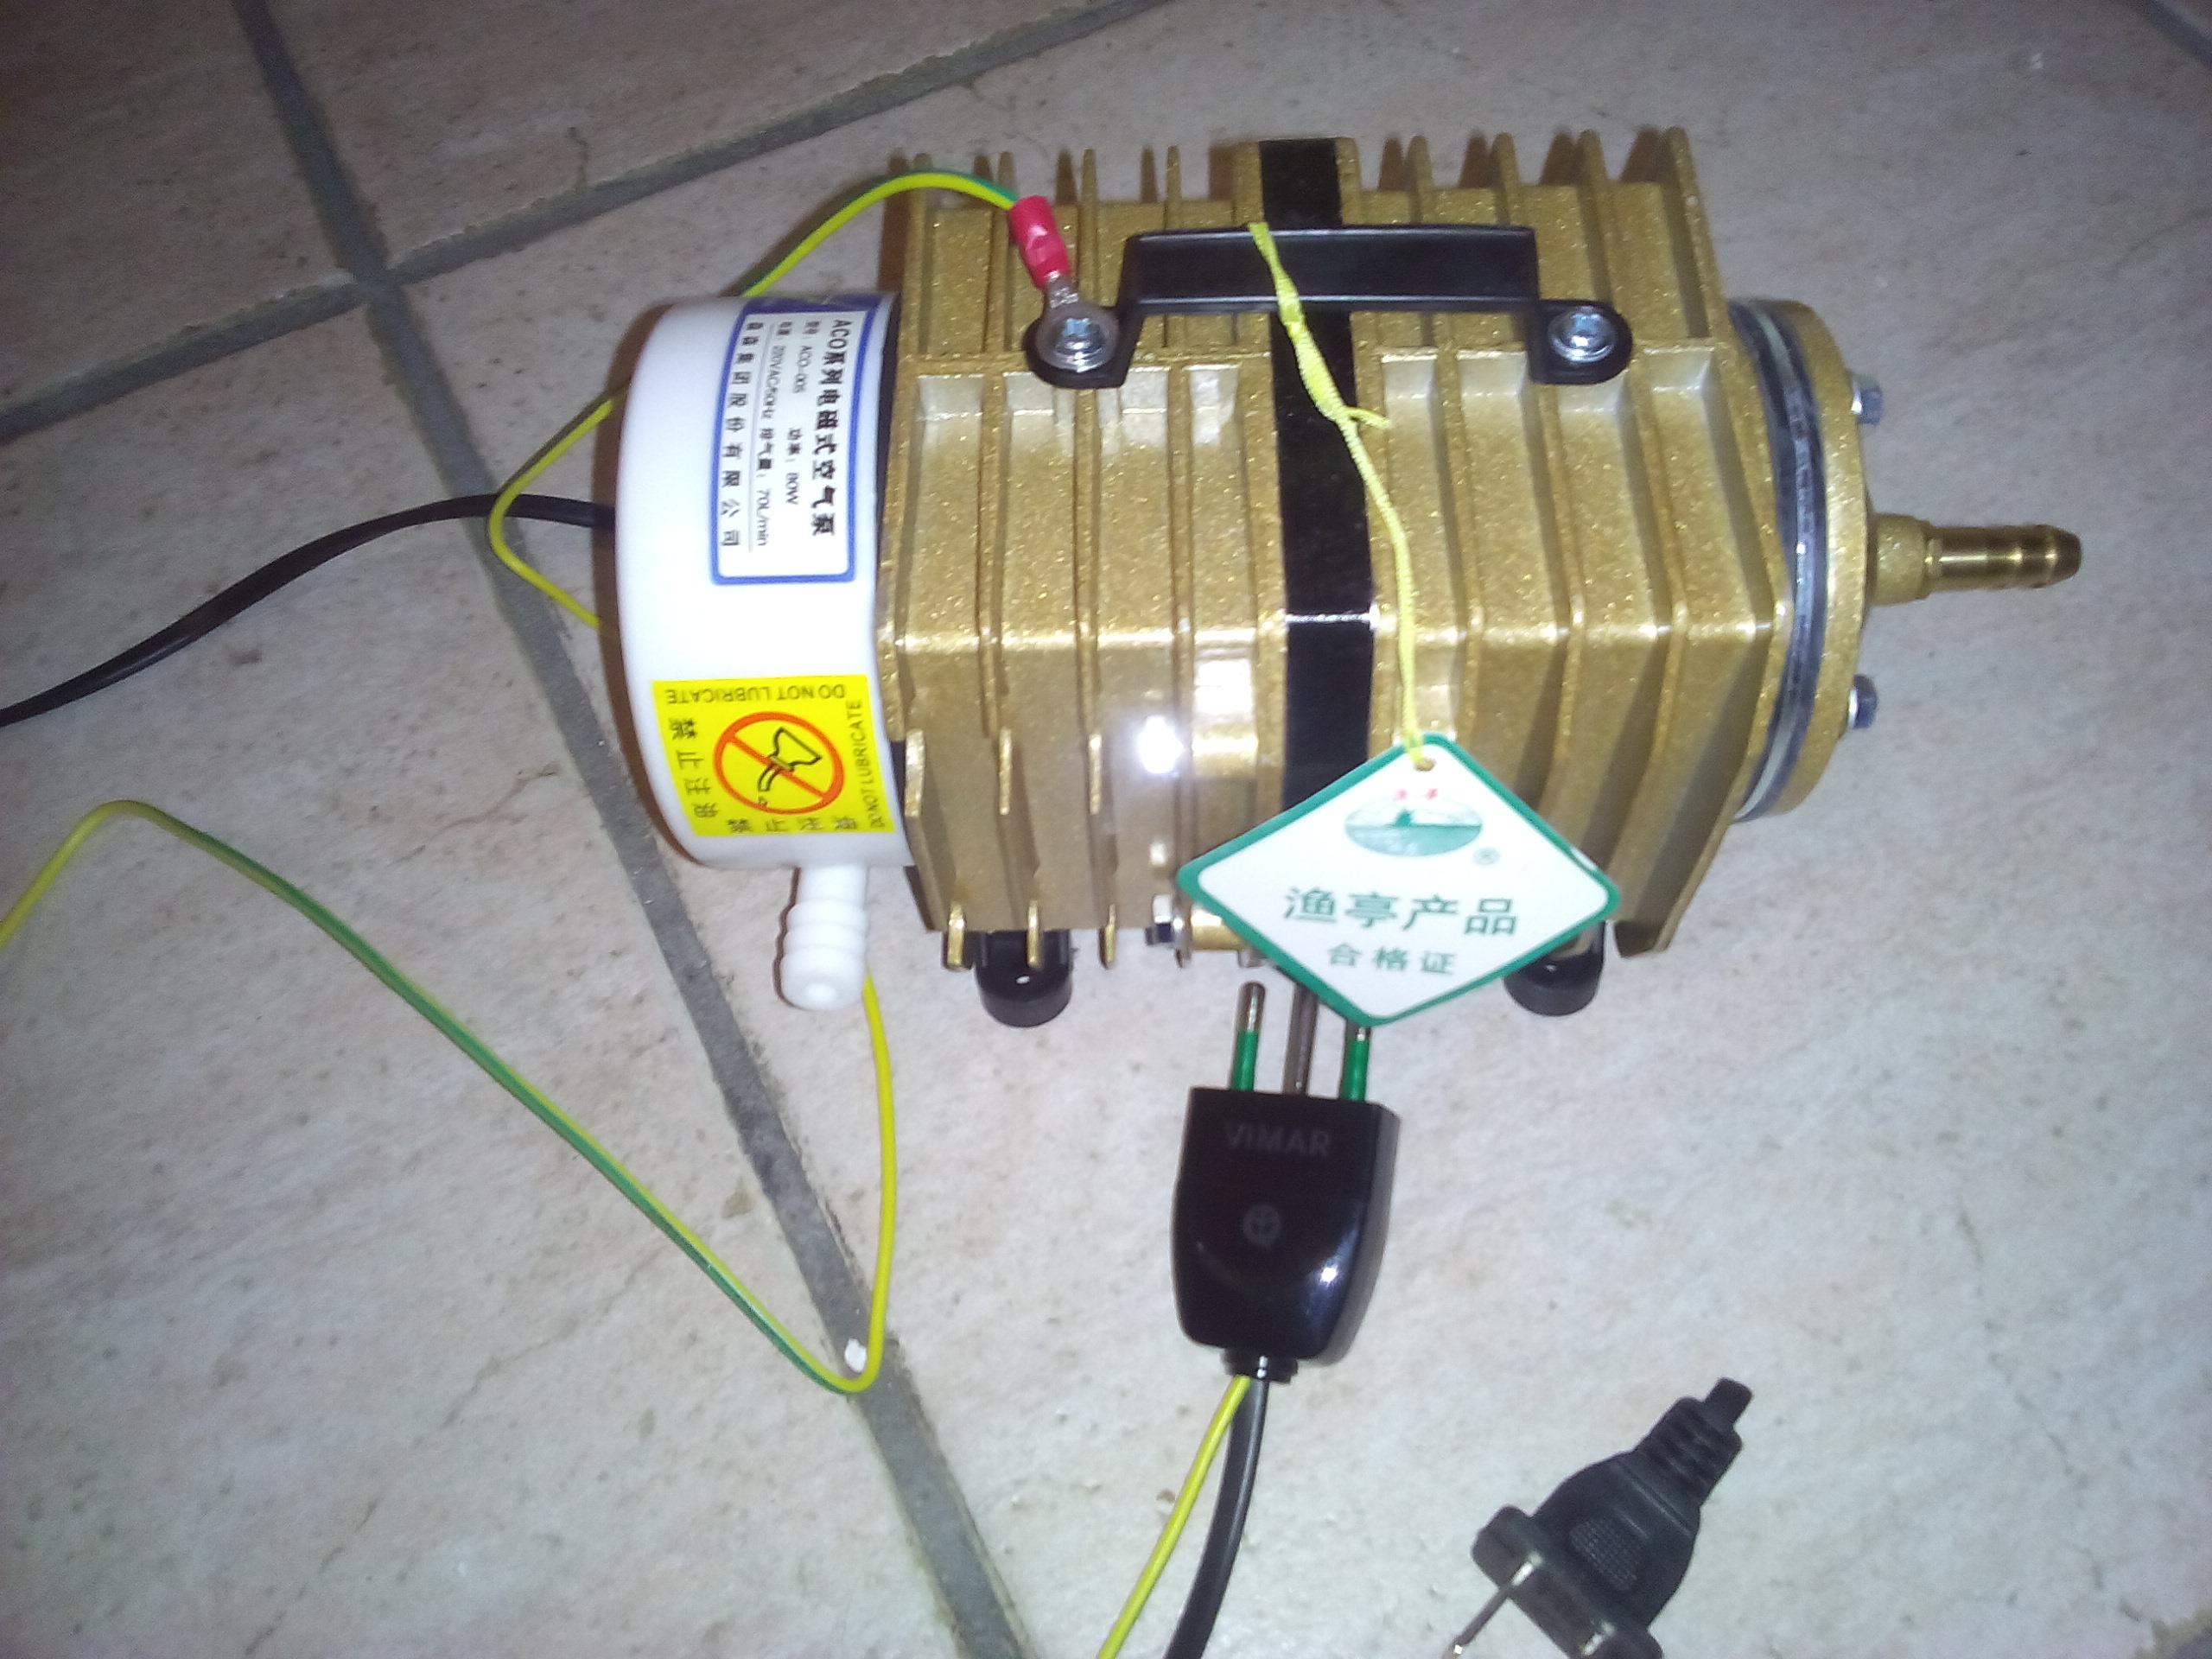 laser-co2-60w-700x500-ebay-cina-3